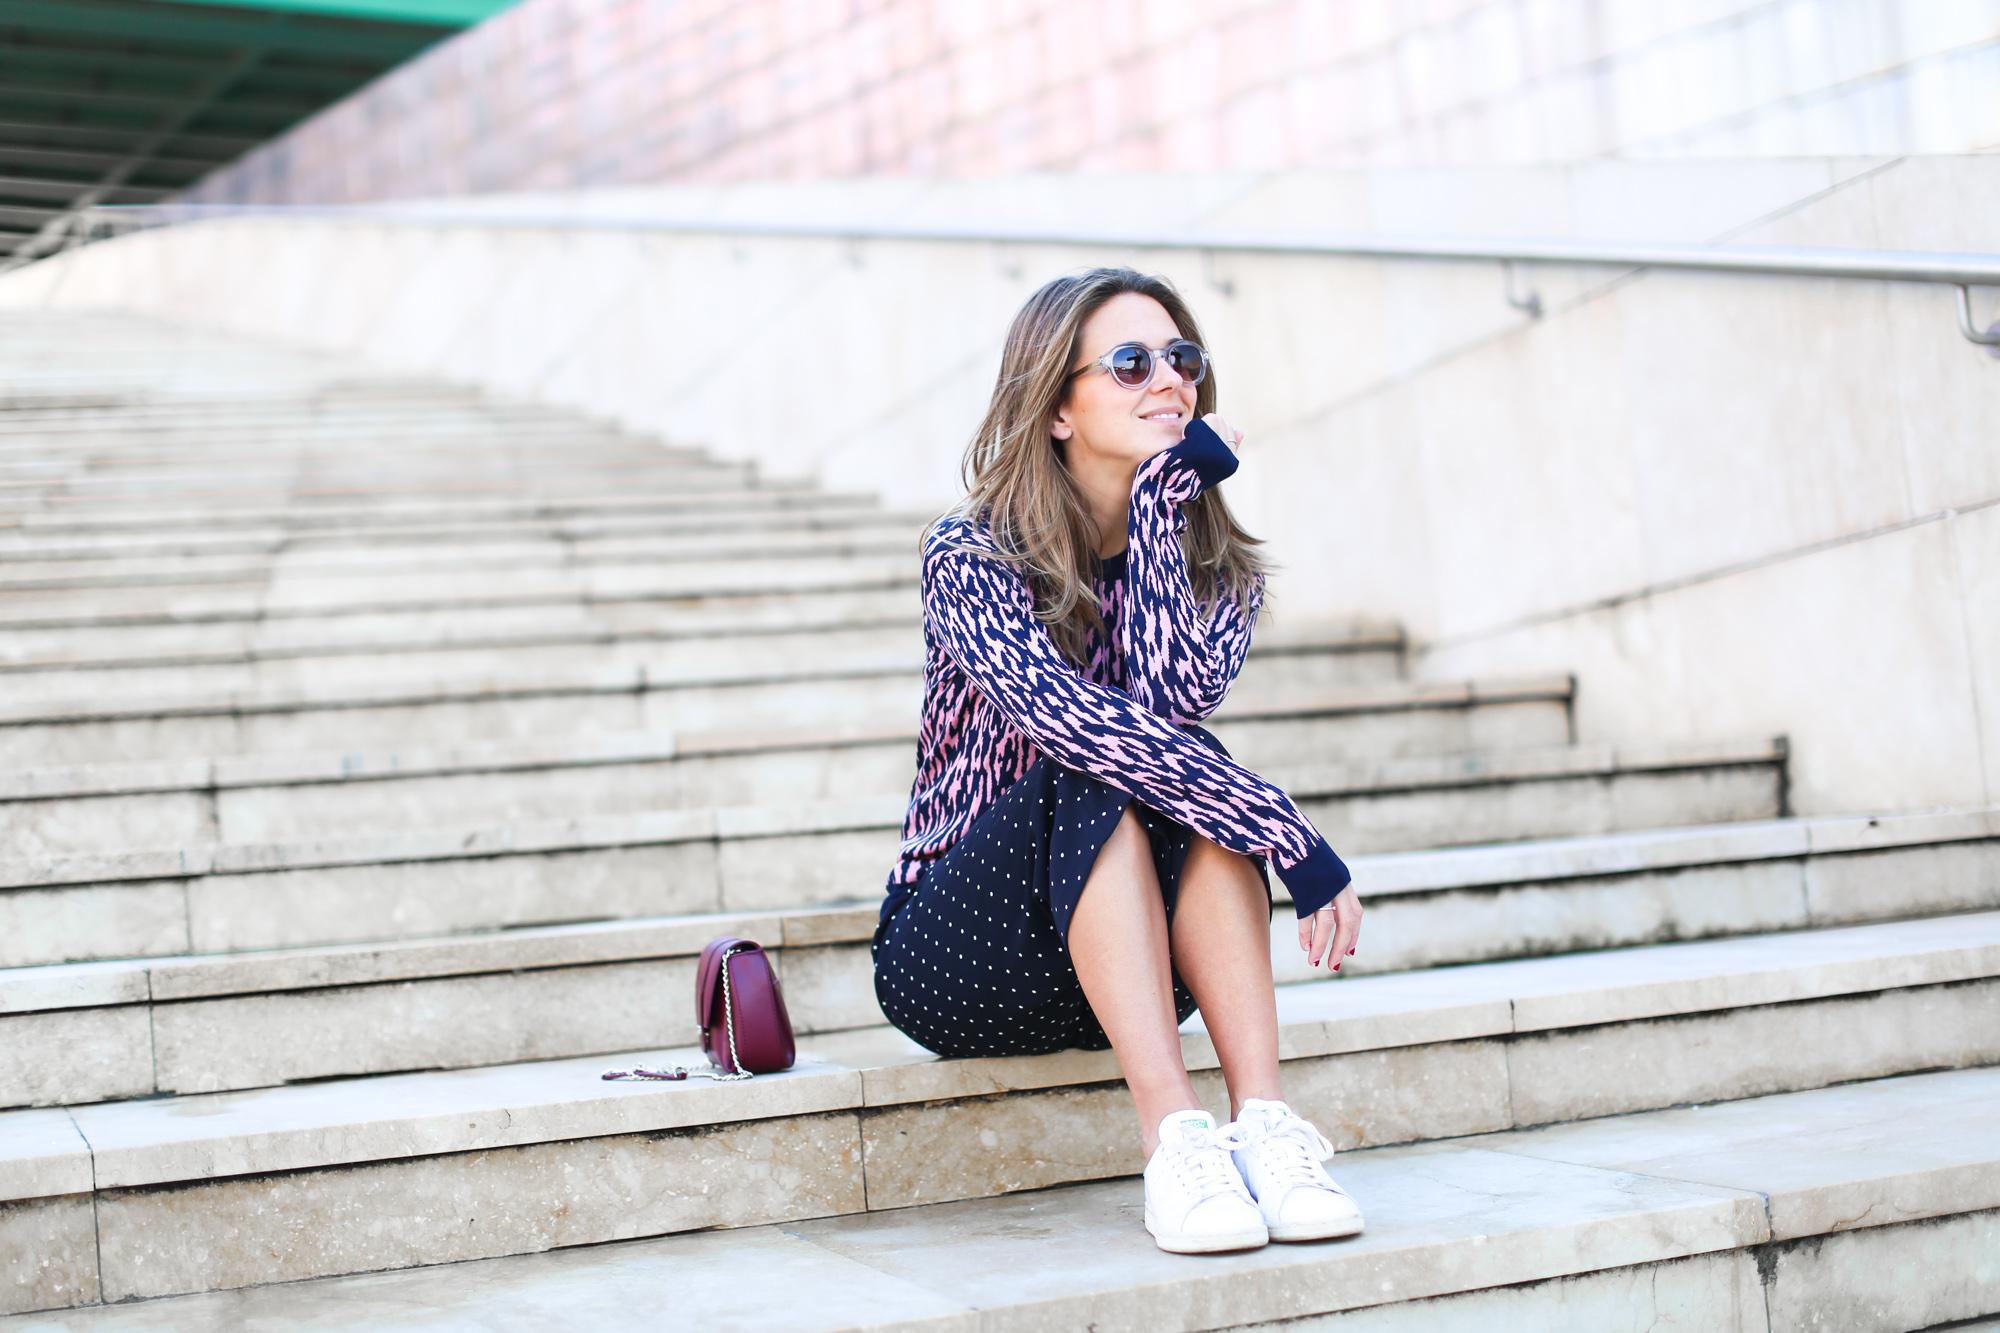 Clochet_streetstyle_fashionblogger_andotherstories_merinowooljacquardsweater_leopardprintpinkandblue_adidasstansmith-9